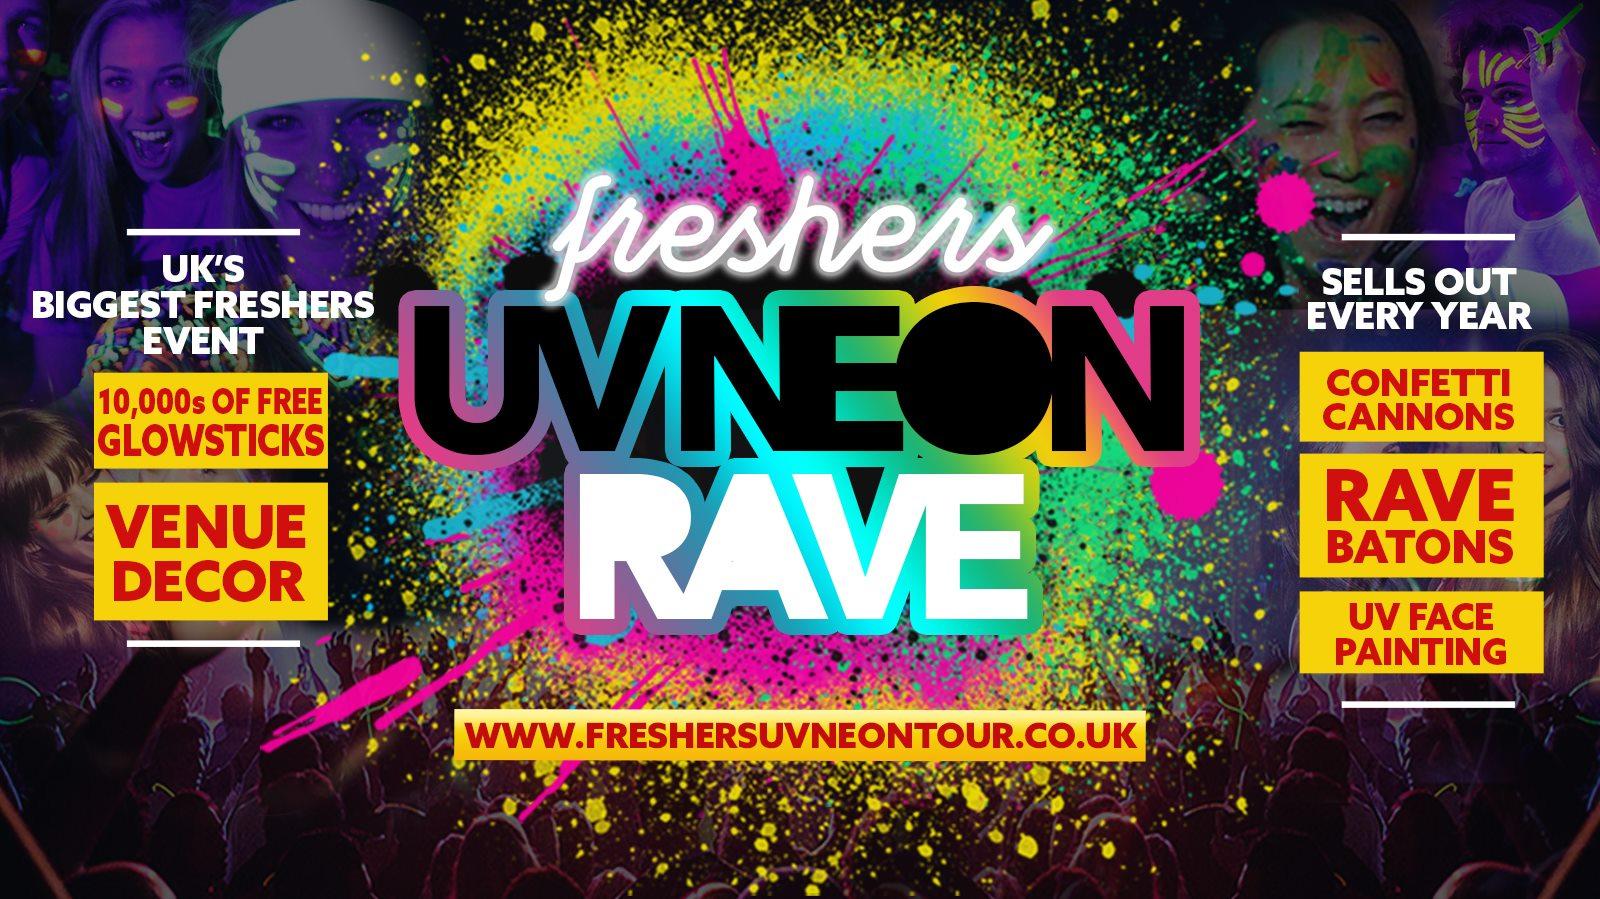 Cambridge Freshers UV Neon Rave | Cambridge Freshers 2021